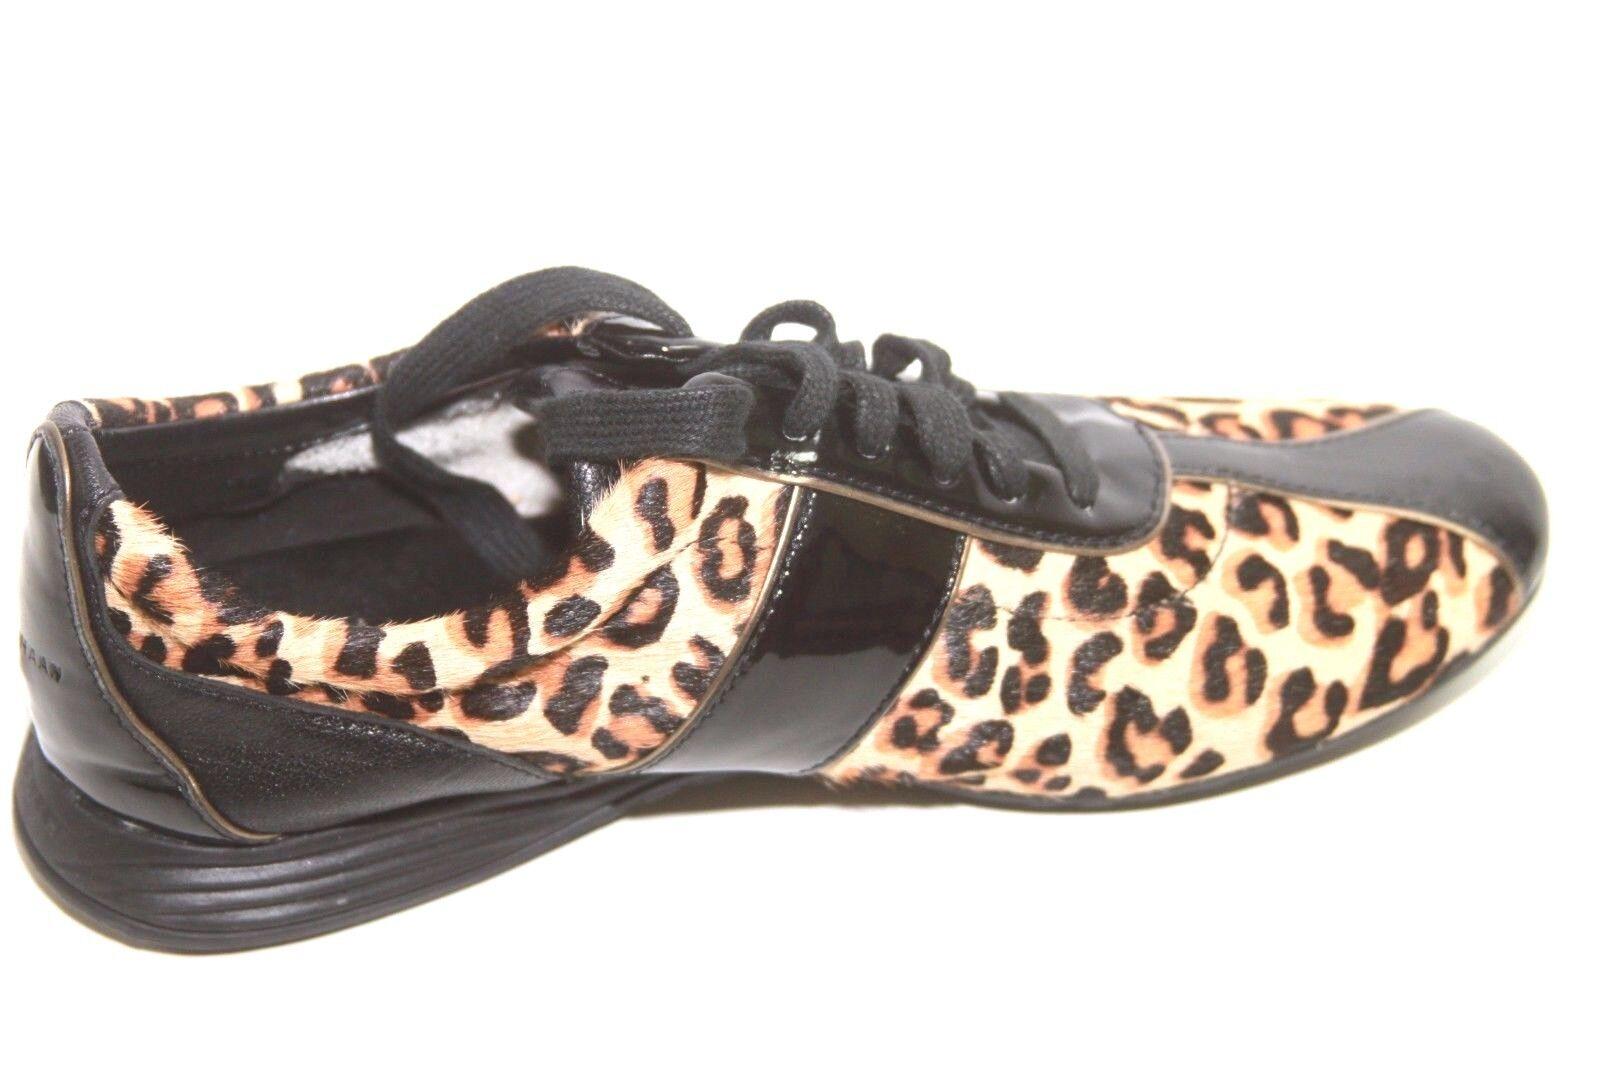 Cole Haan W00266 Cheetah Print Calf Hair Patent Bria Bria Bria Grand Sneakers Sz 6.5 NWOB cd1535